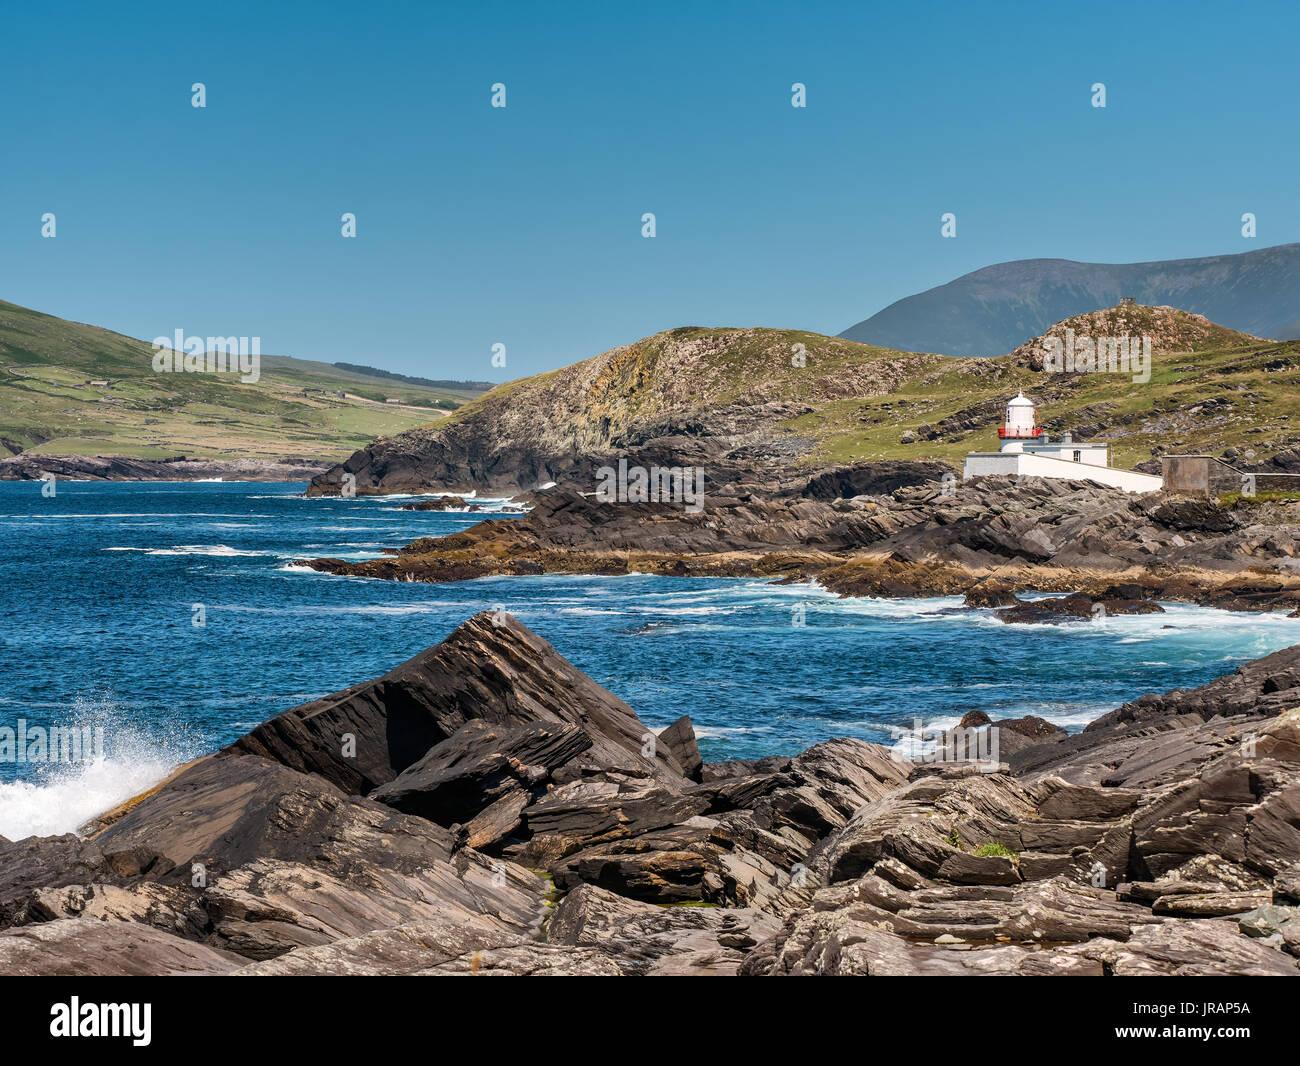 Valentia Island Lighthouse in far Western Ireland - Stock Image